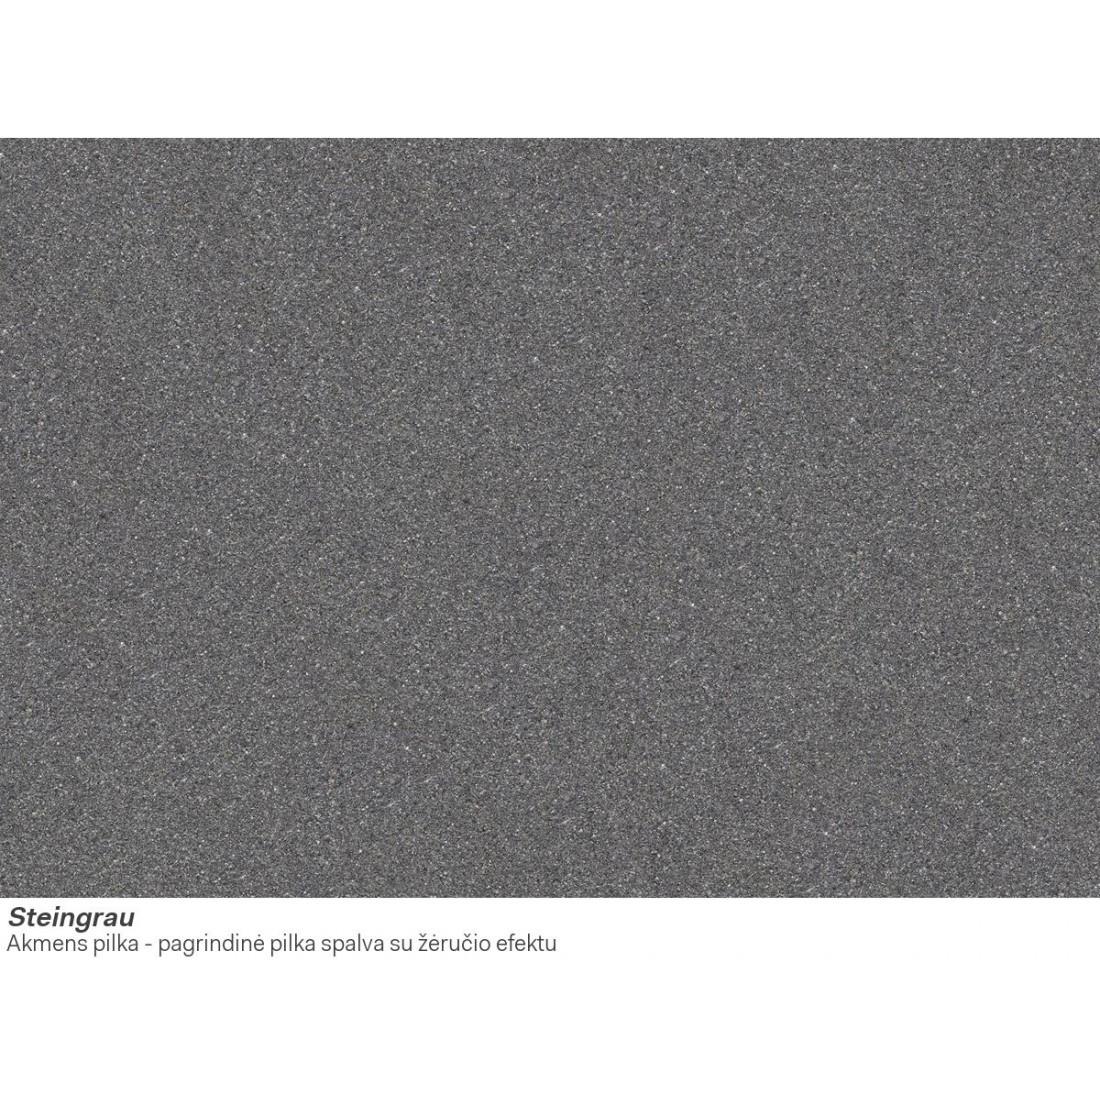 Akmens masės plautuvė Franke Basis BFG 611-78, Steingrau